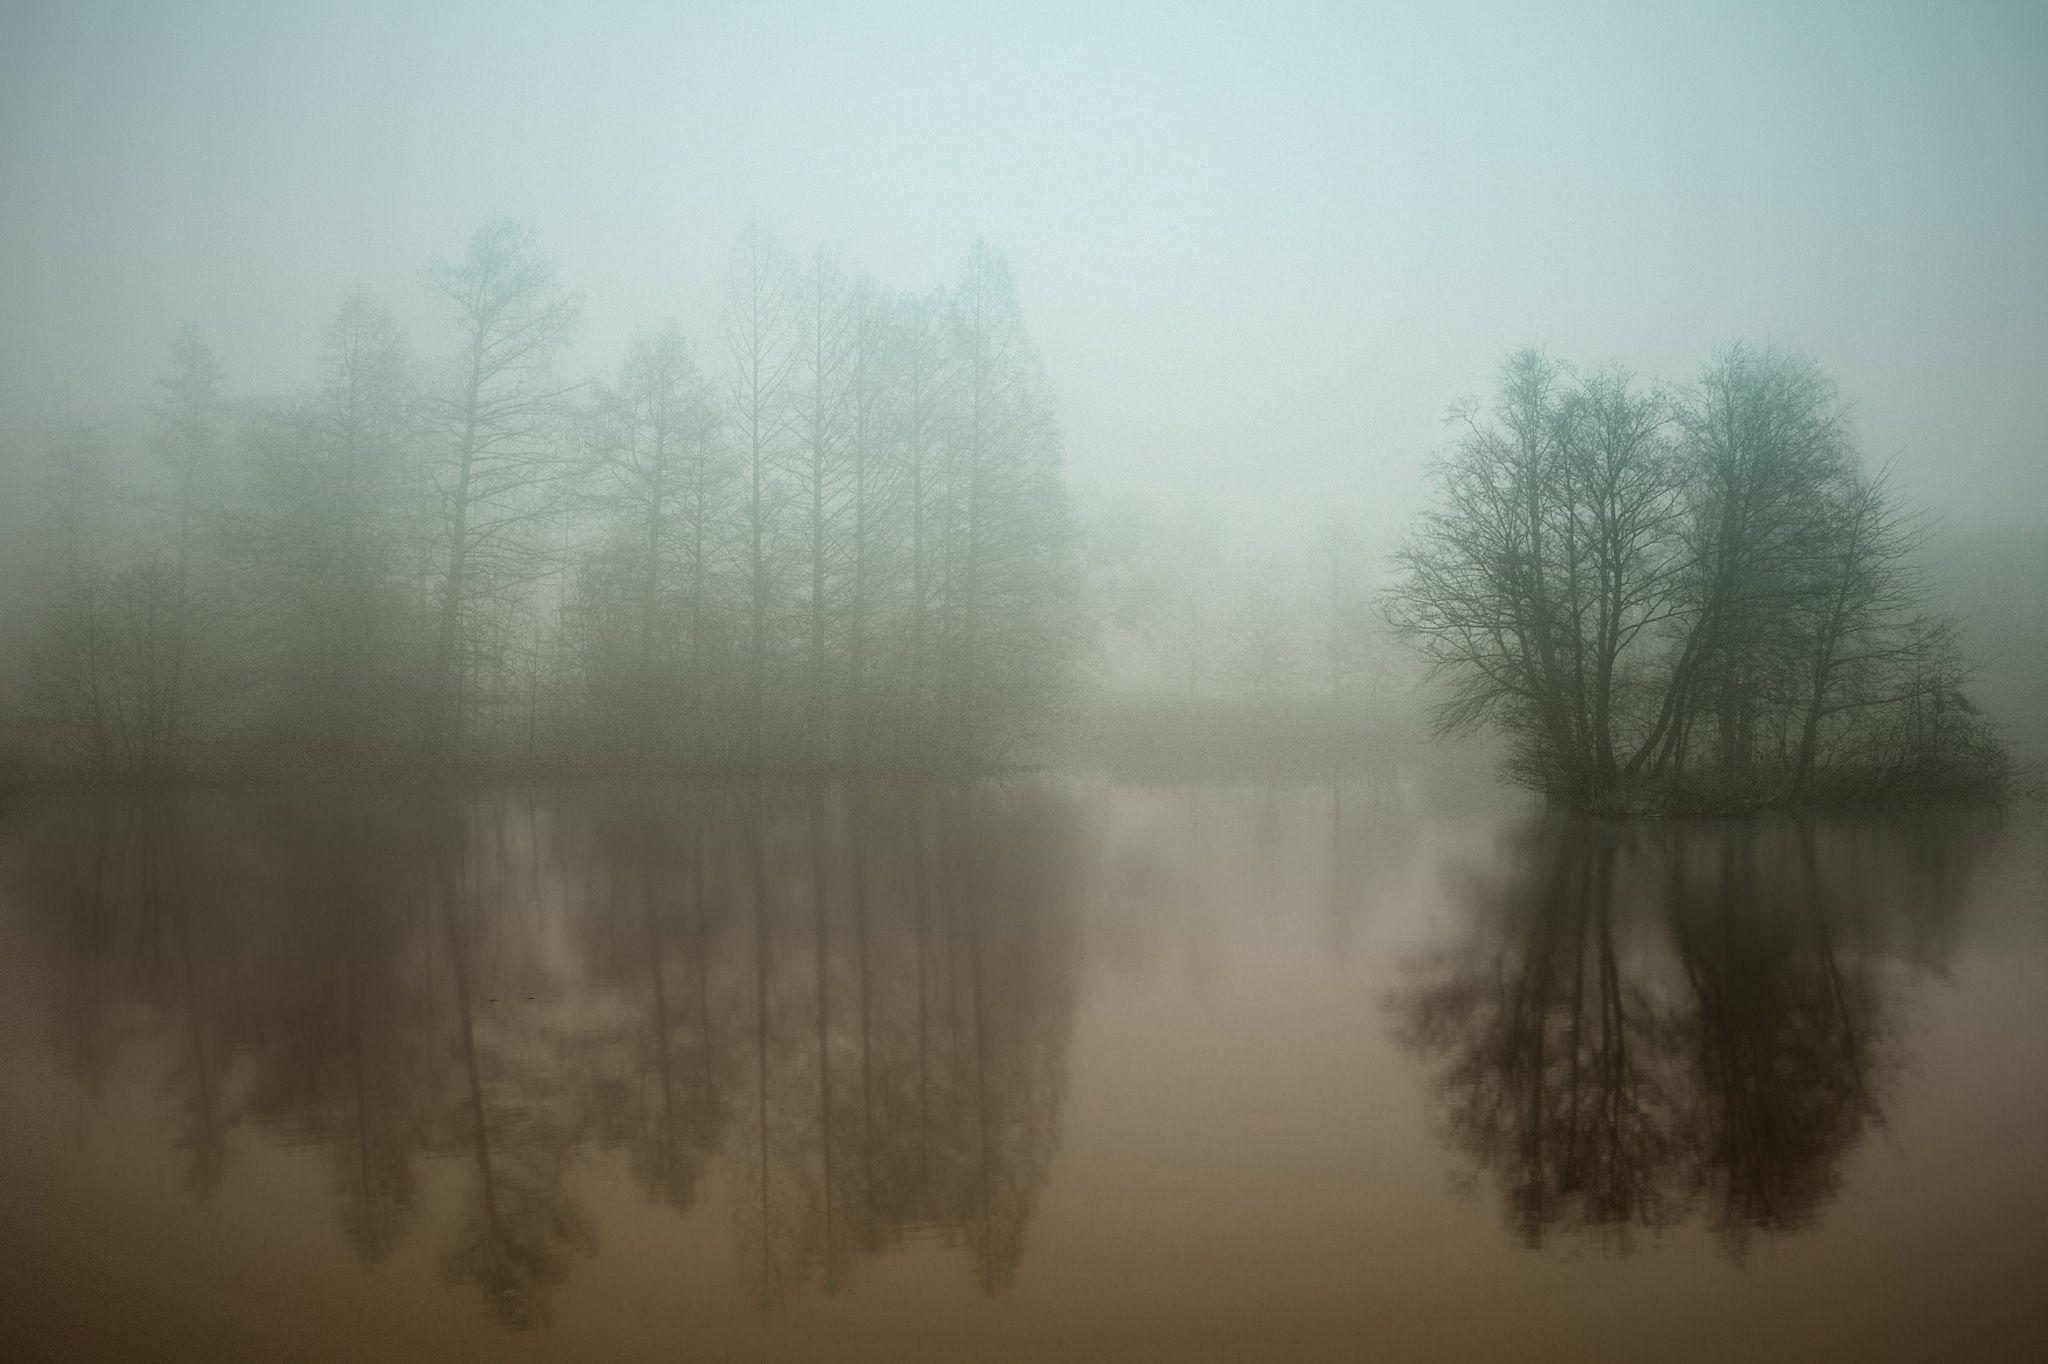 Winter elegy by Katalin Gerencsér on 500px